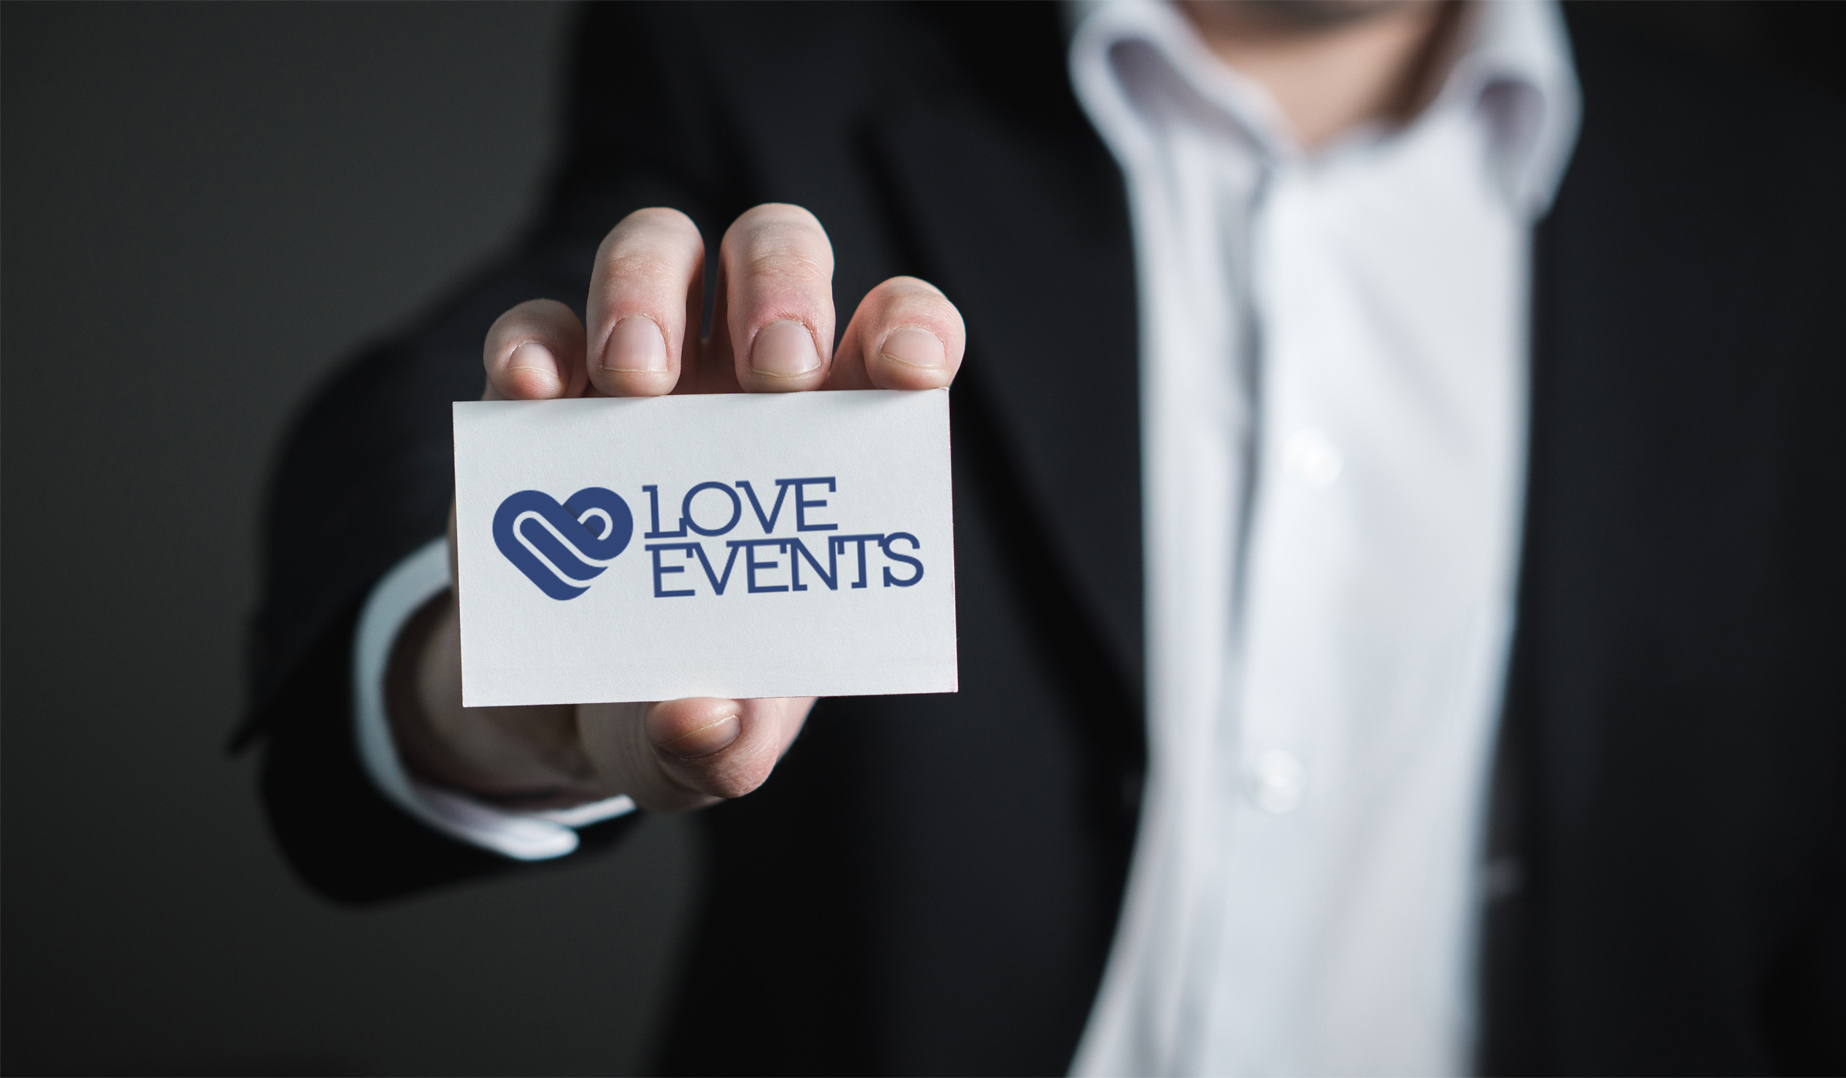 loveevents.com